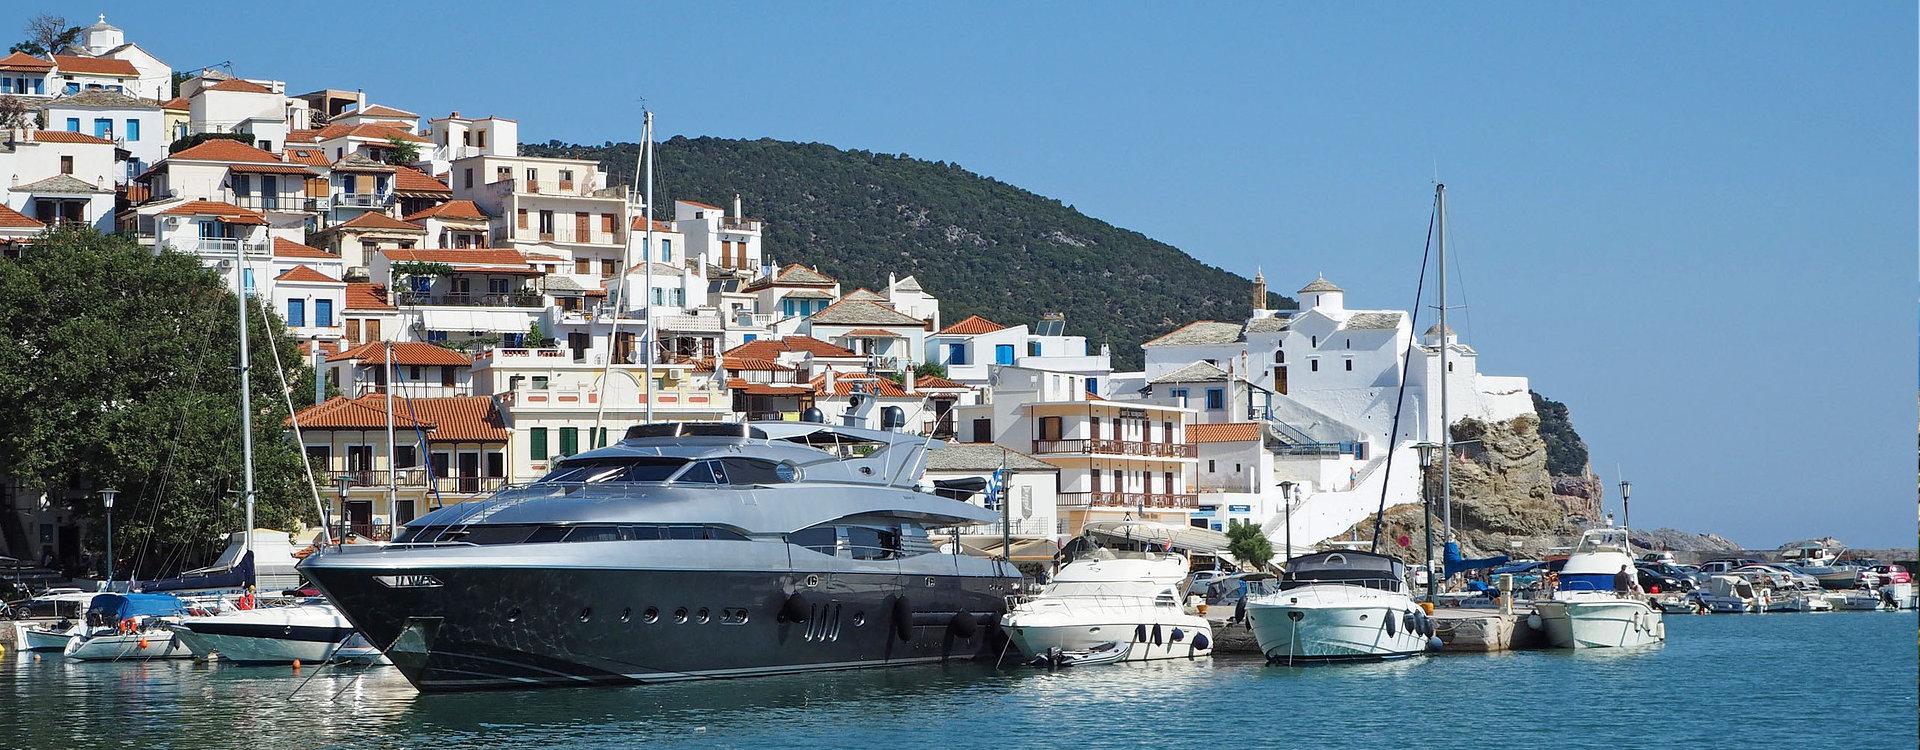 Greece yacht charter motor yachts sailing boats for Motor boat rental greece